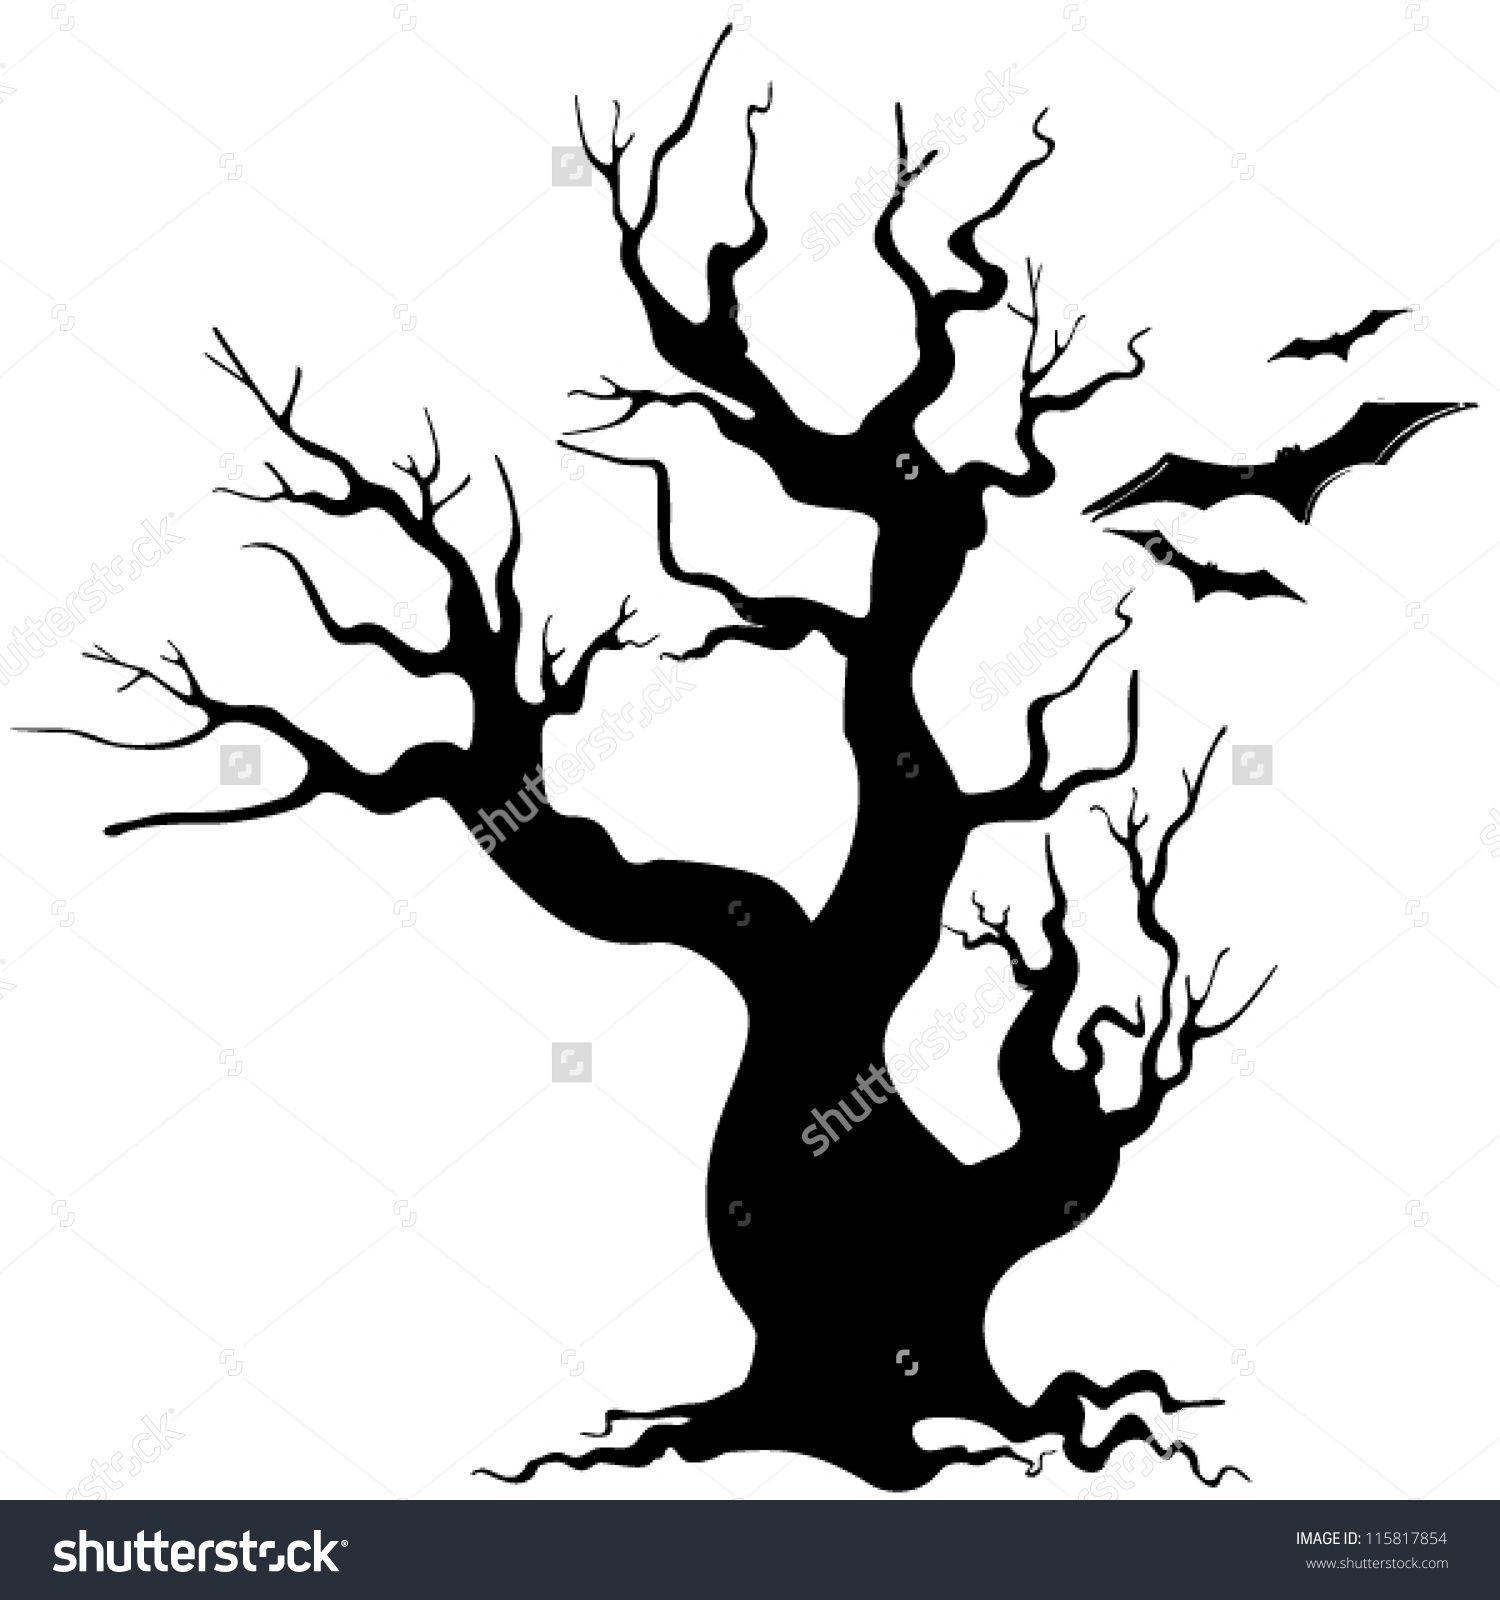 Haunted Template Of A Tree Tree Silhouette Drawing 46 Jpg 1 500 1 600 Pixels Christmas Tree Drawing Tree Drawing Nightmare Before Christmas Tree